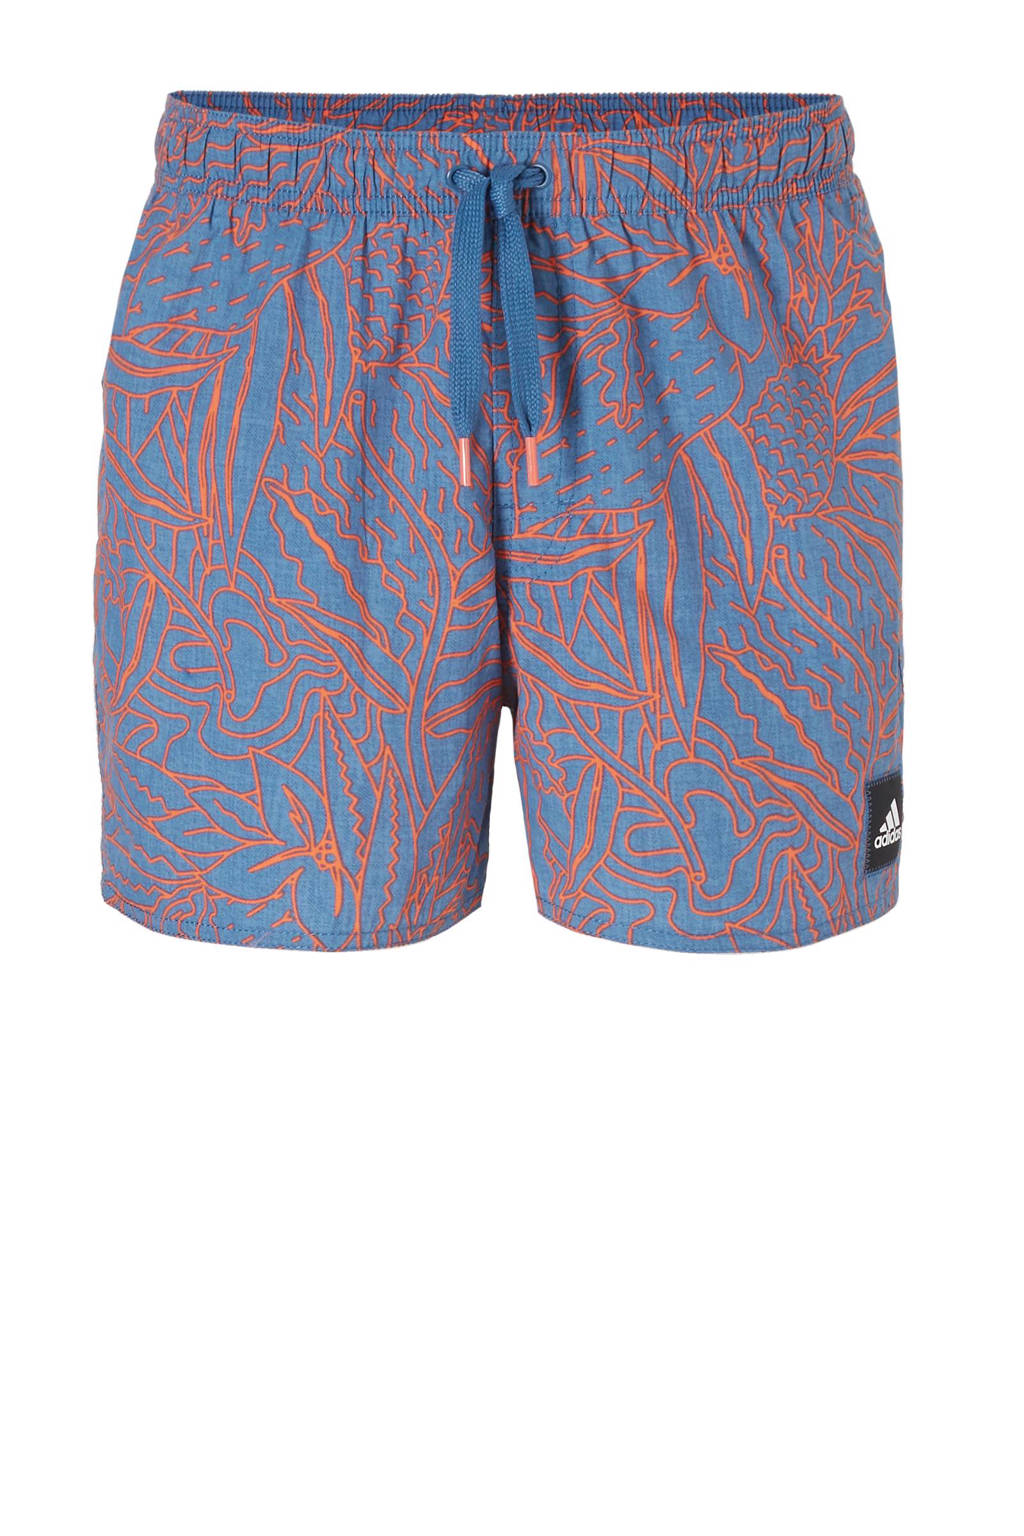 e78425c0da0f59 adidas performance zwemshort, Blauw/oranje